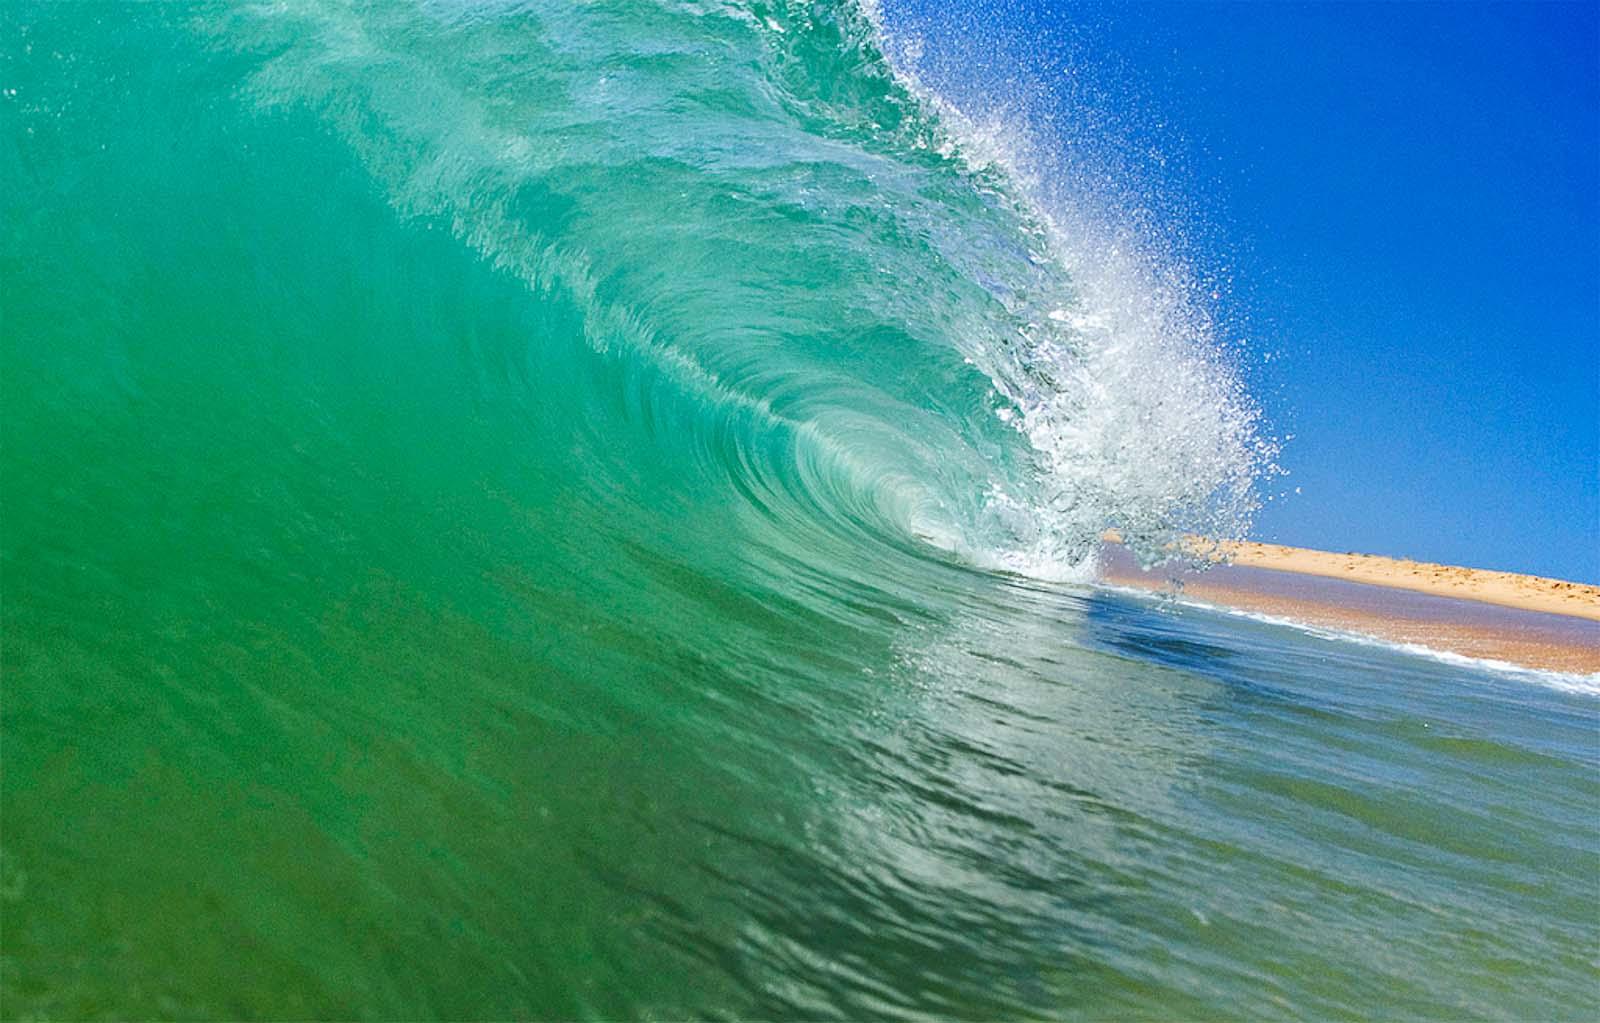 Barrel wave | YWAM Sydney, Newtown | Australia